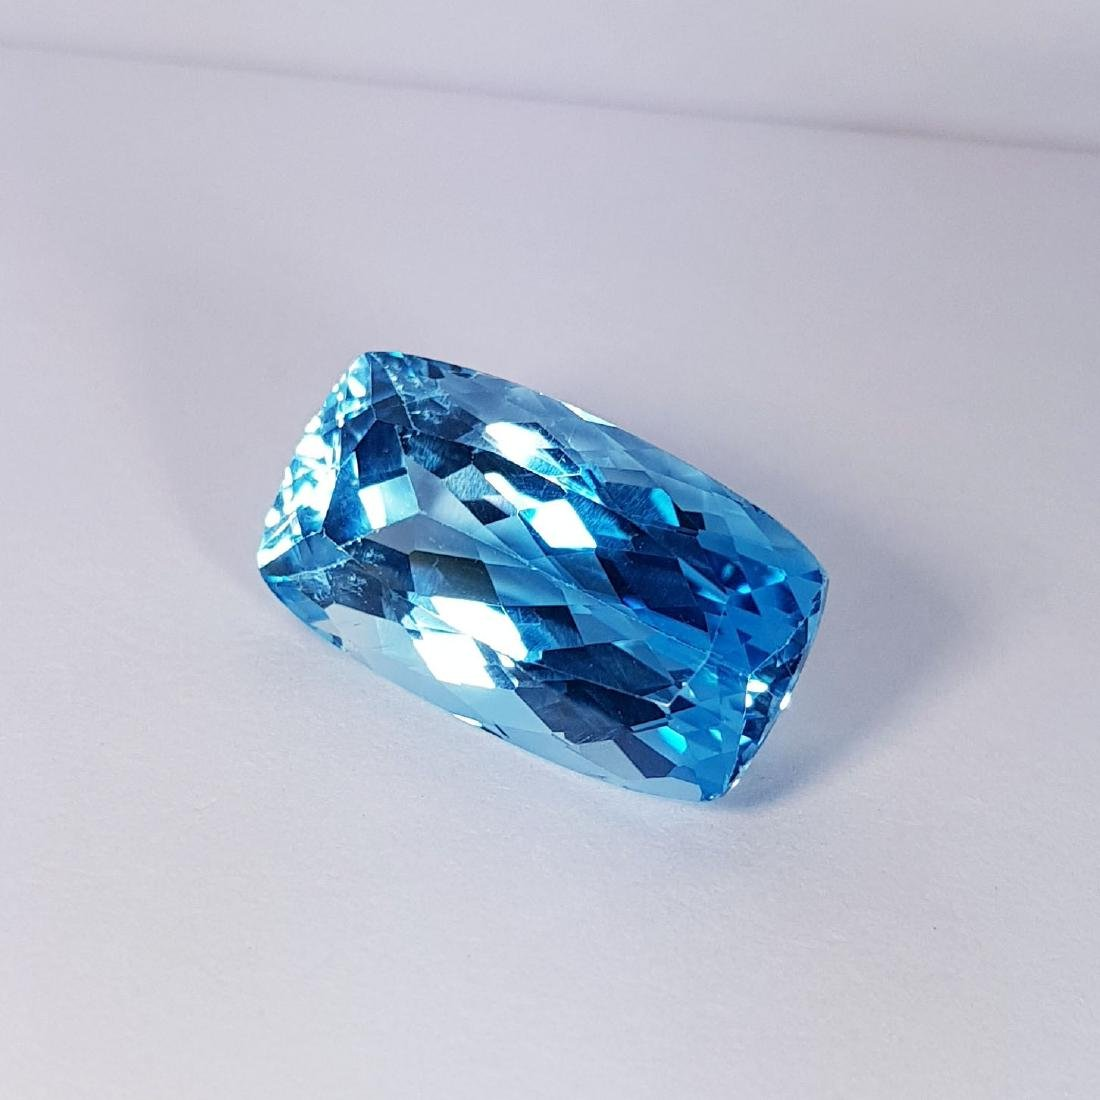 Natural Swiss Blue Topaz - 25.16 ct - 3